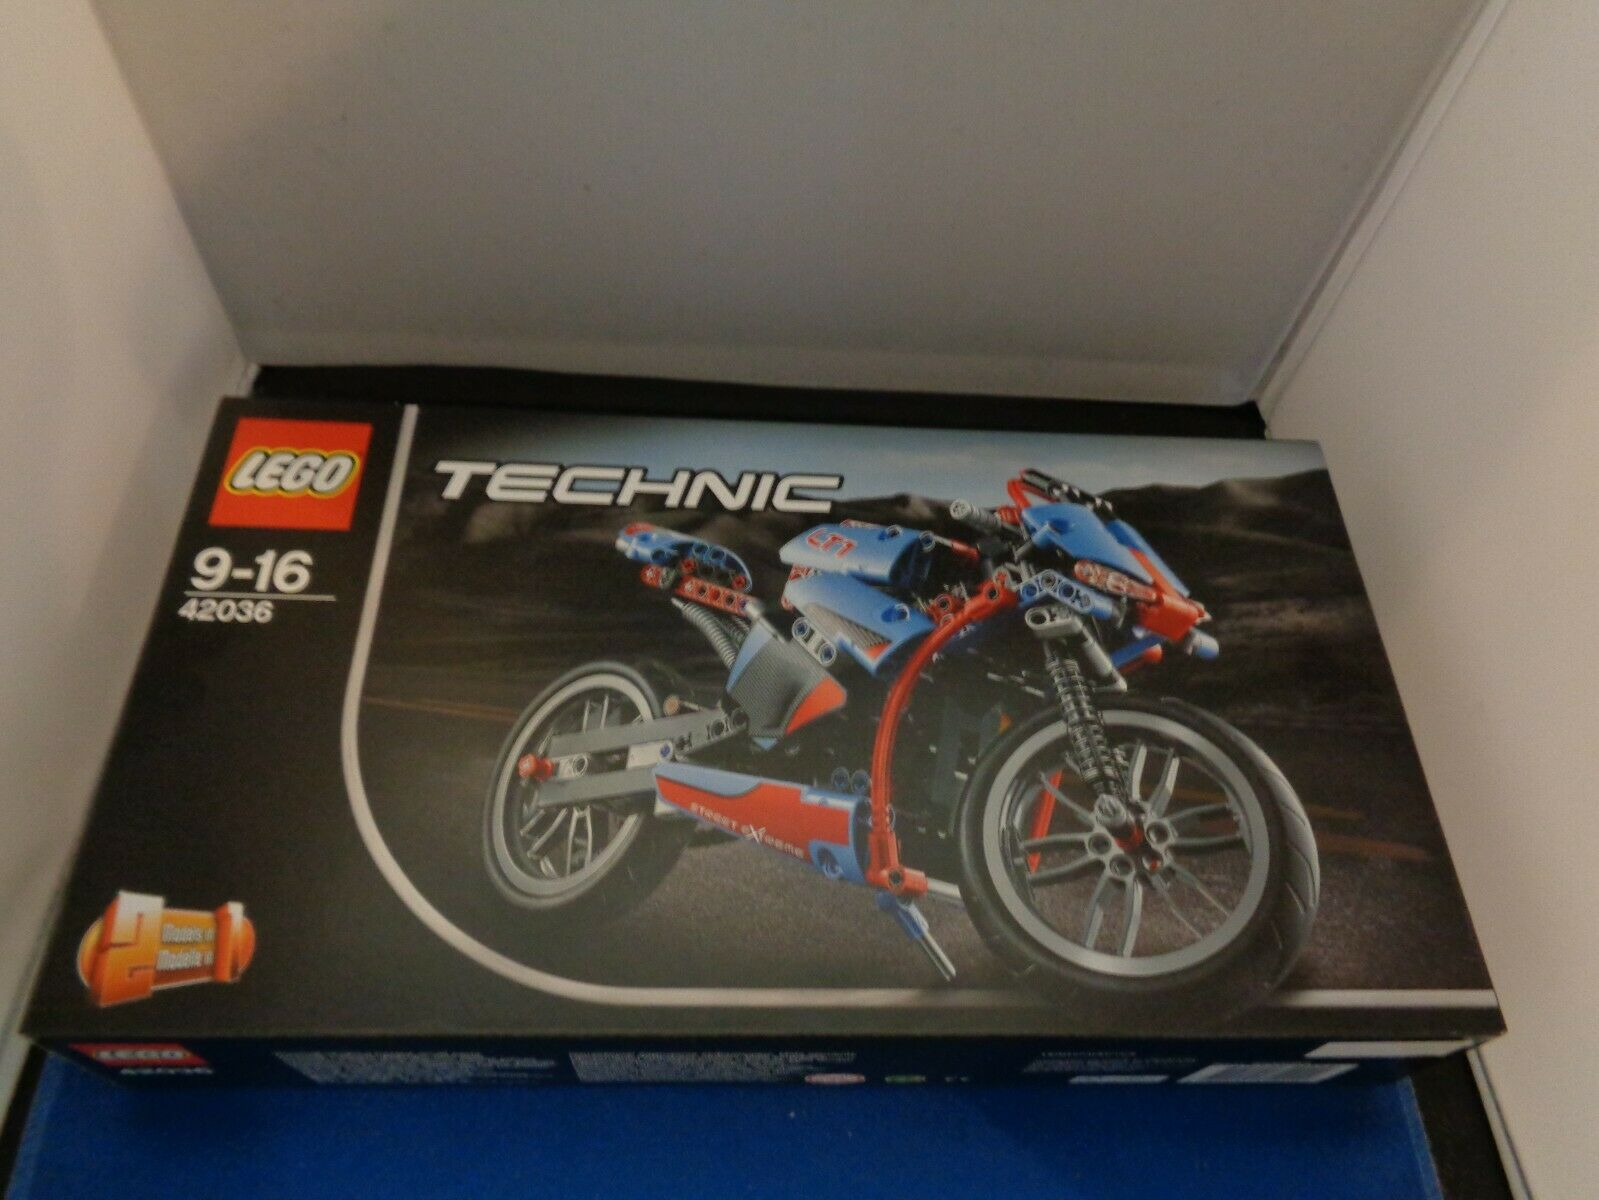 LEGO Technic 42036 Street Motorcycle RETIrot - new in sealed box